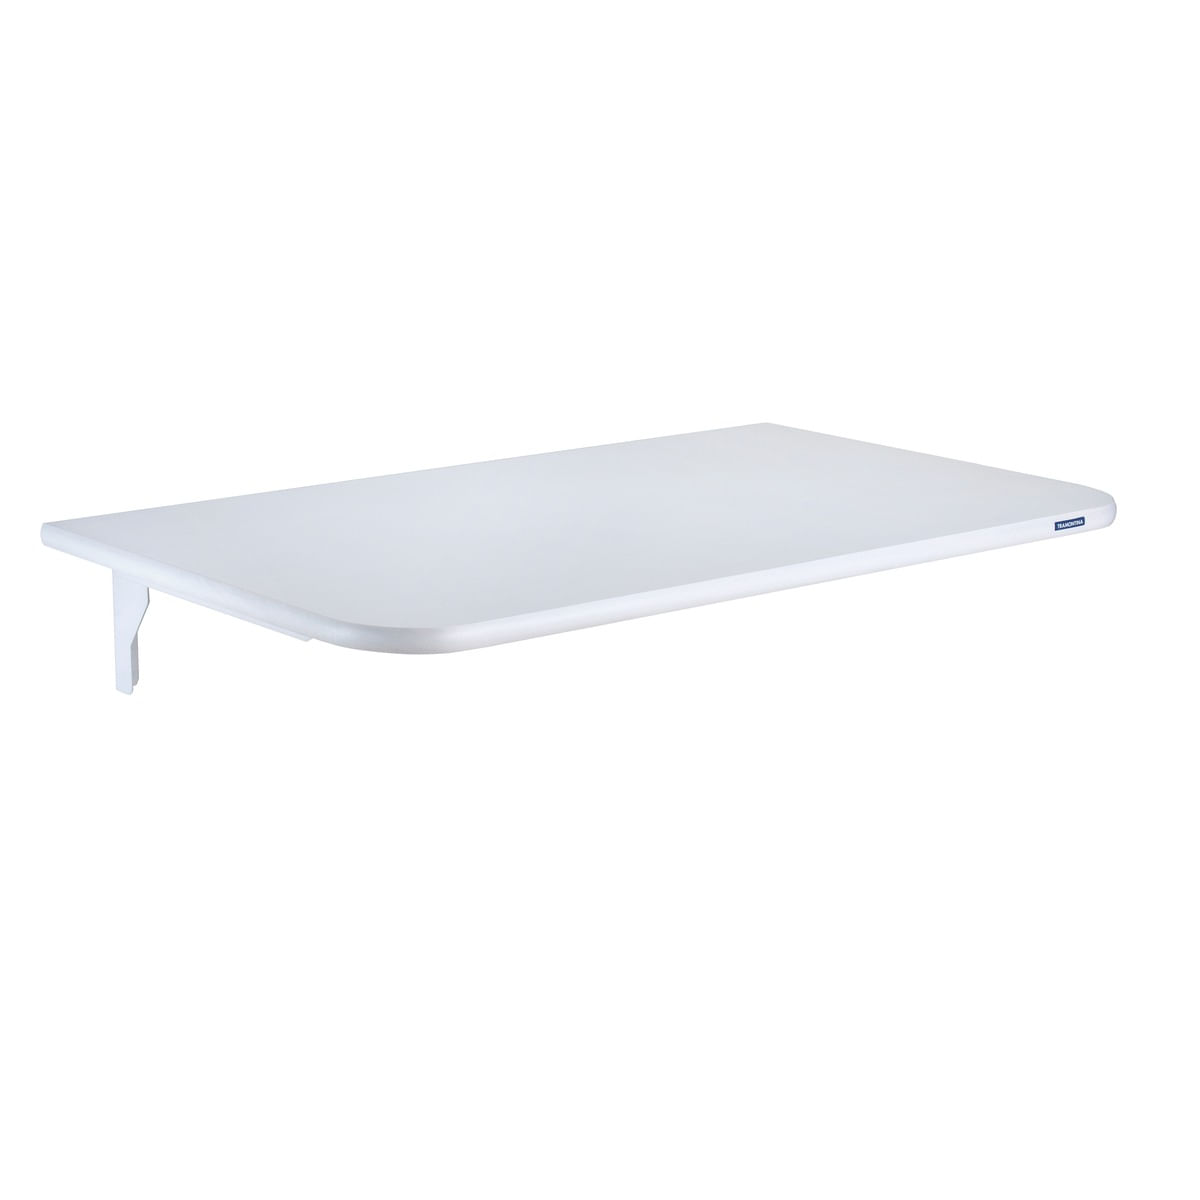 Mesa Dobrável Branca Tramontina 75 x 45 cm 91734074